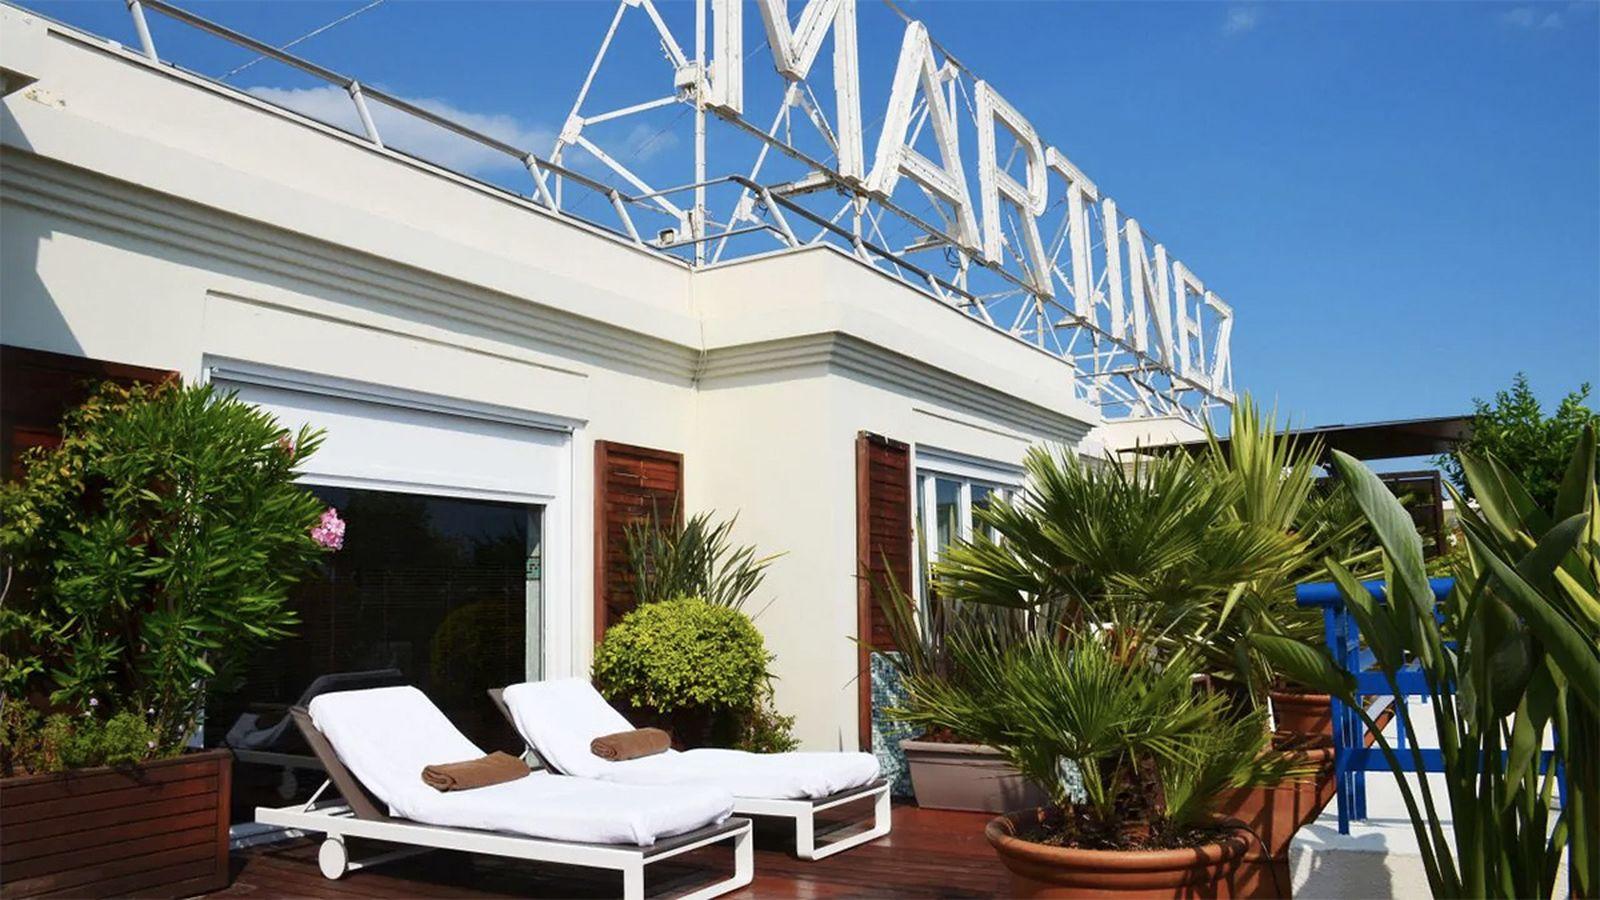 martinez hotel hotels plaza hotel the palms